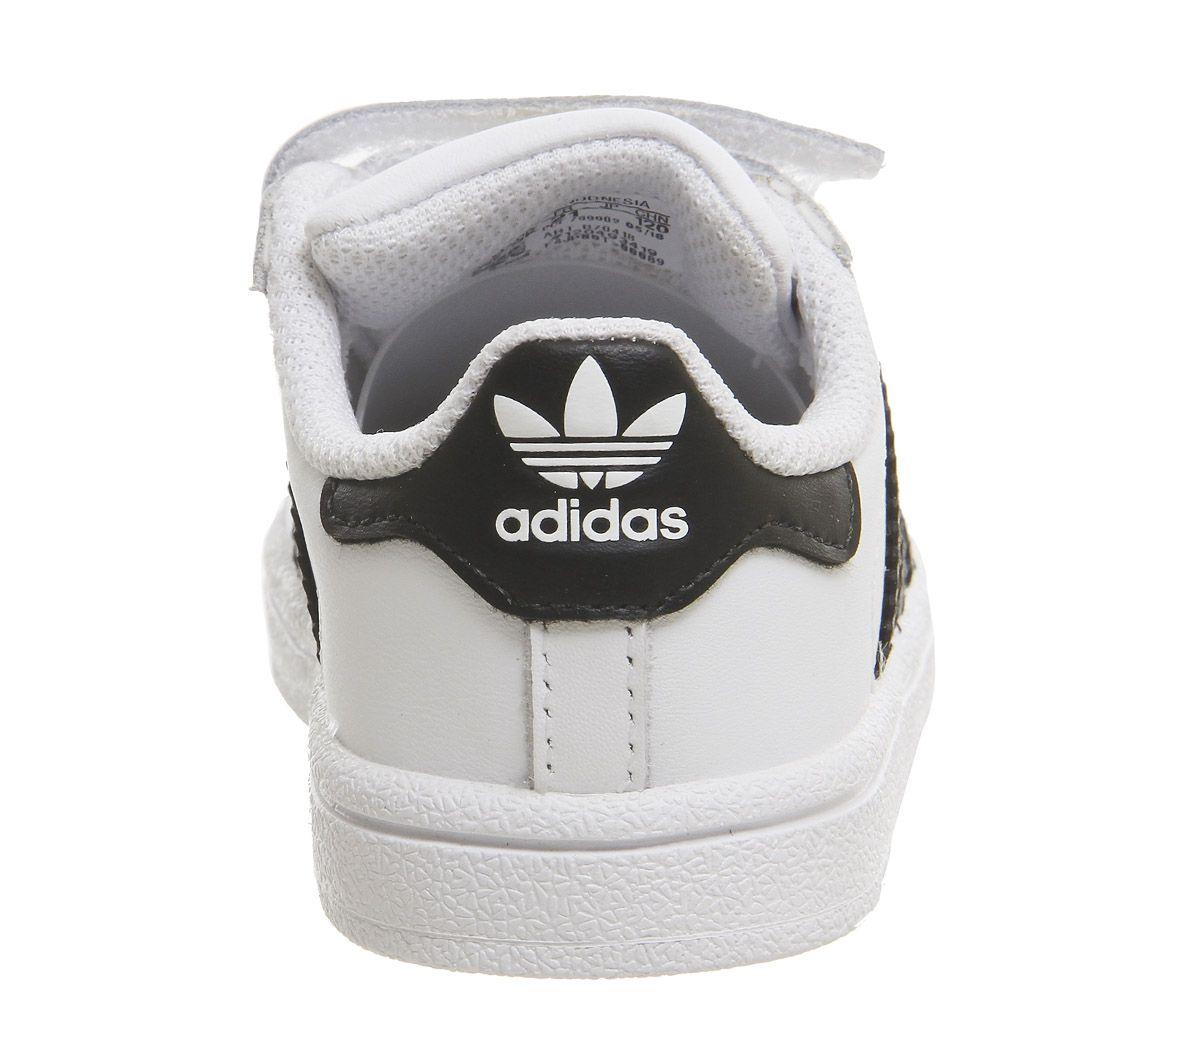 huge discount be3c4 a5ed3 Kids-Bambino-ADIDAS-SUPERSTAR-2-9-Scarpe-da-